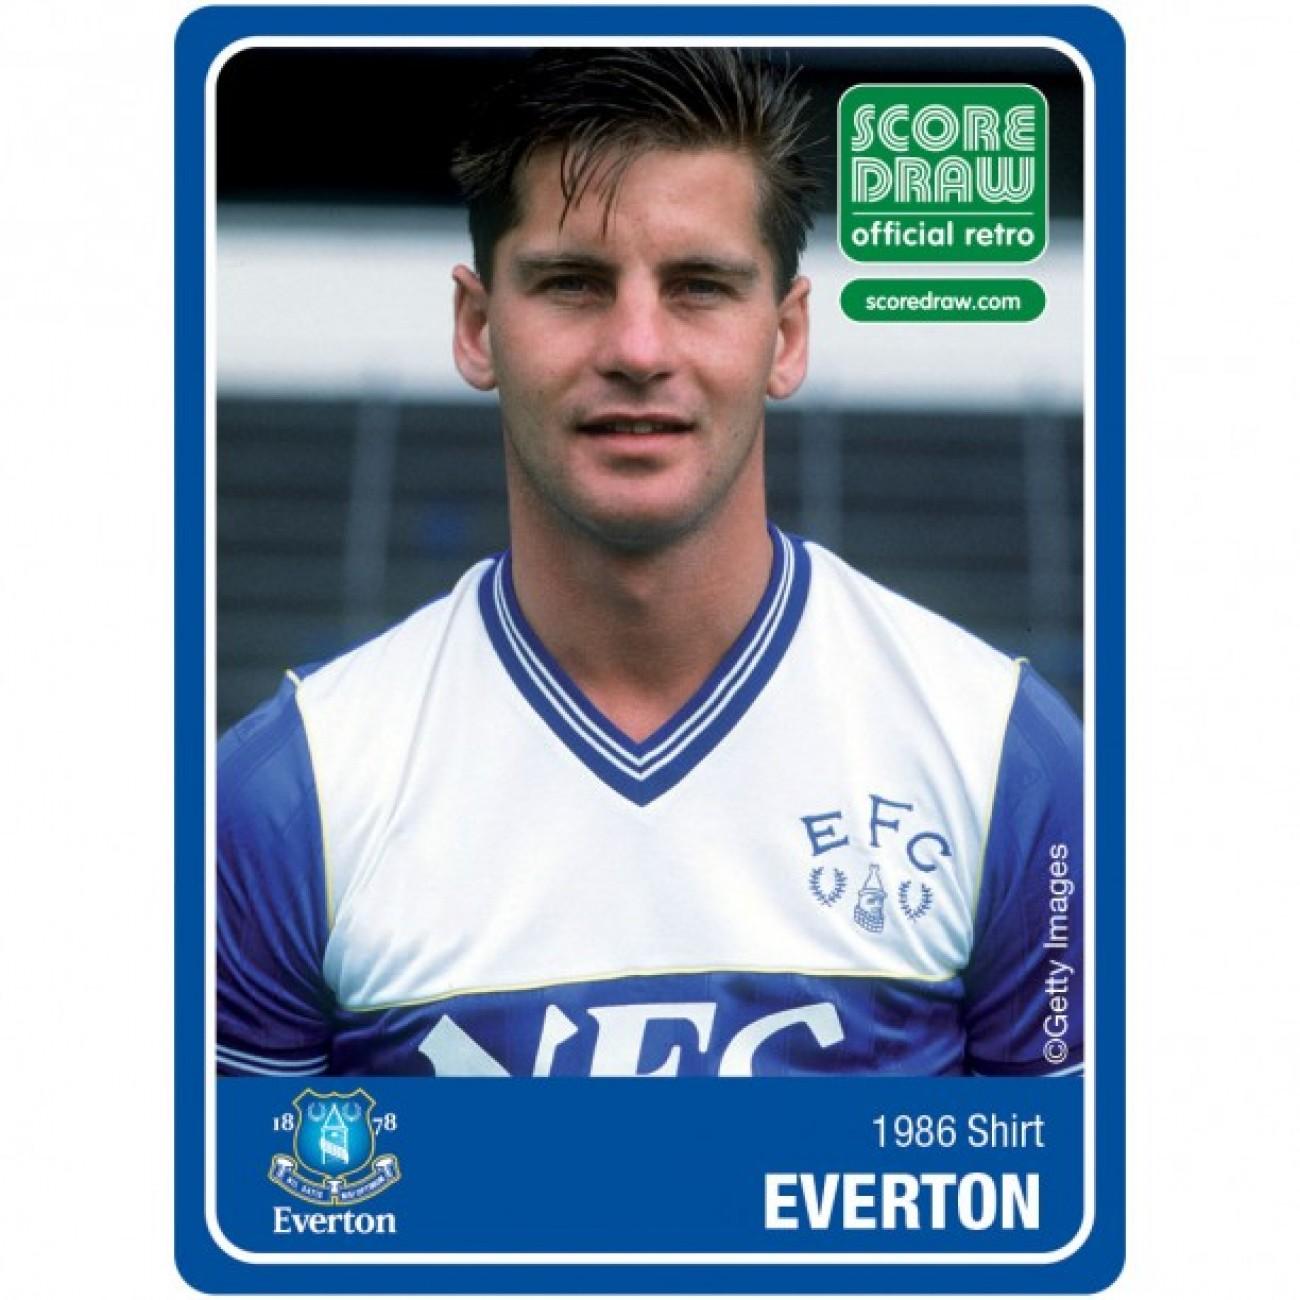 Everton 1986 Retro Shirt